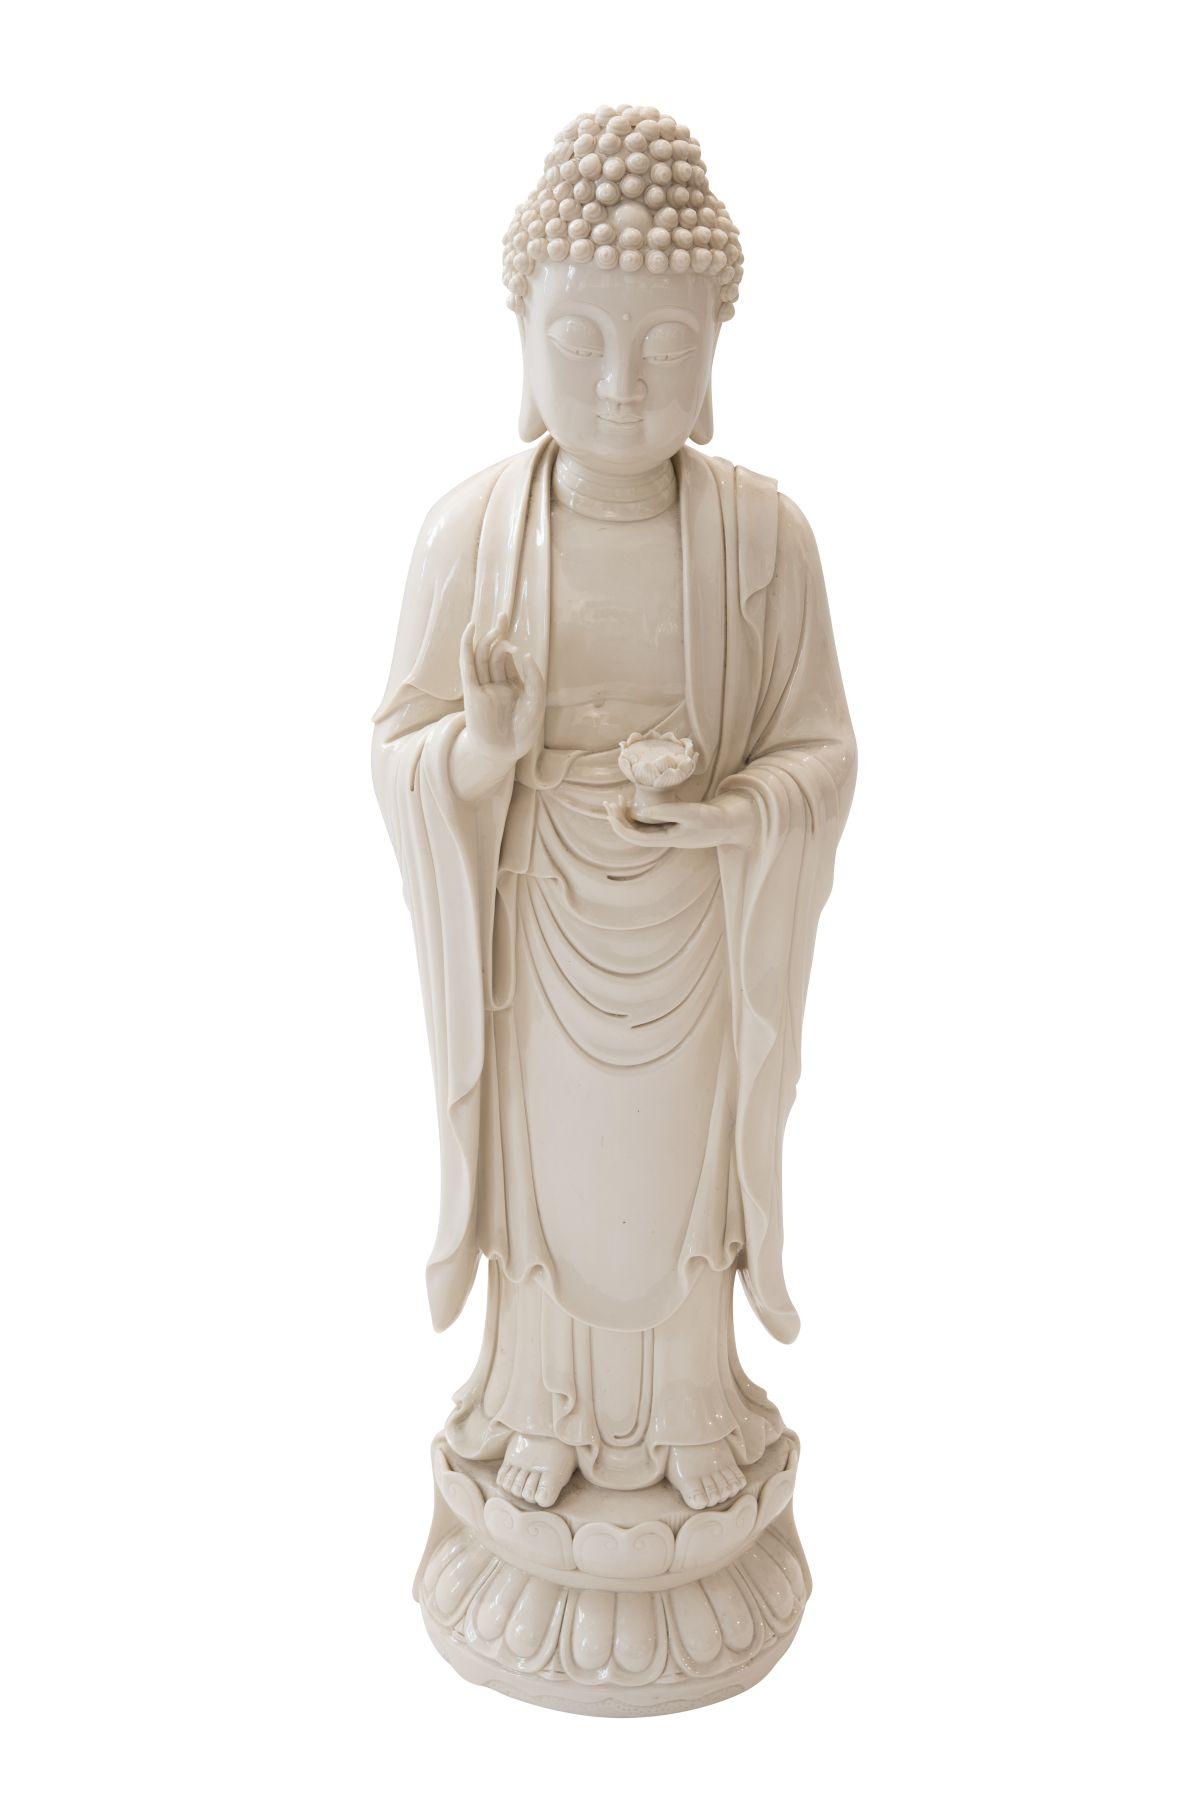 "#11 Blanc de Chine ""Guanyin"", porcelain figure | Blanc de Chine ""Guanyin"", Porzellanfigur Image"